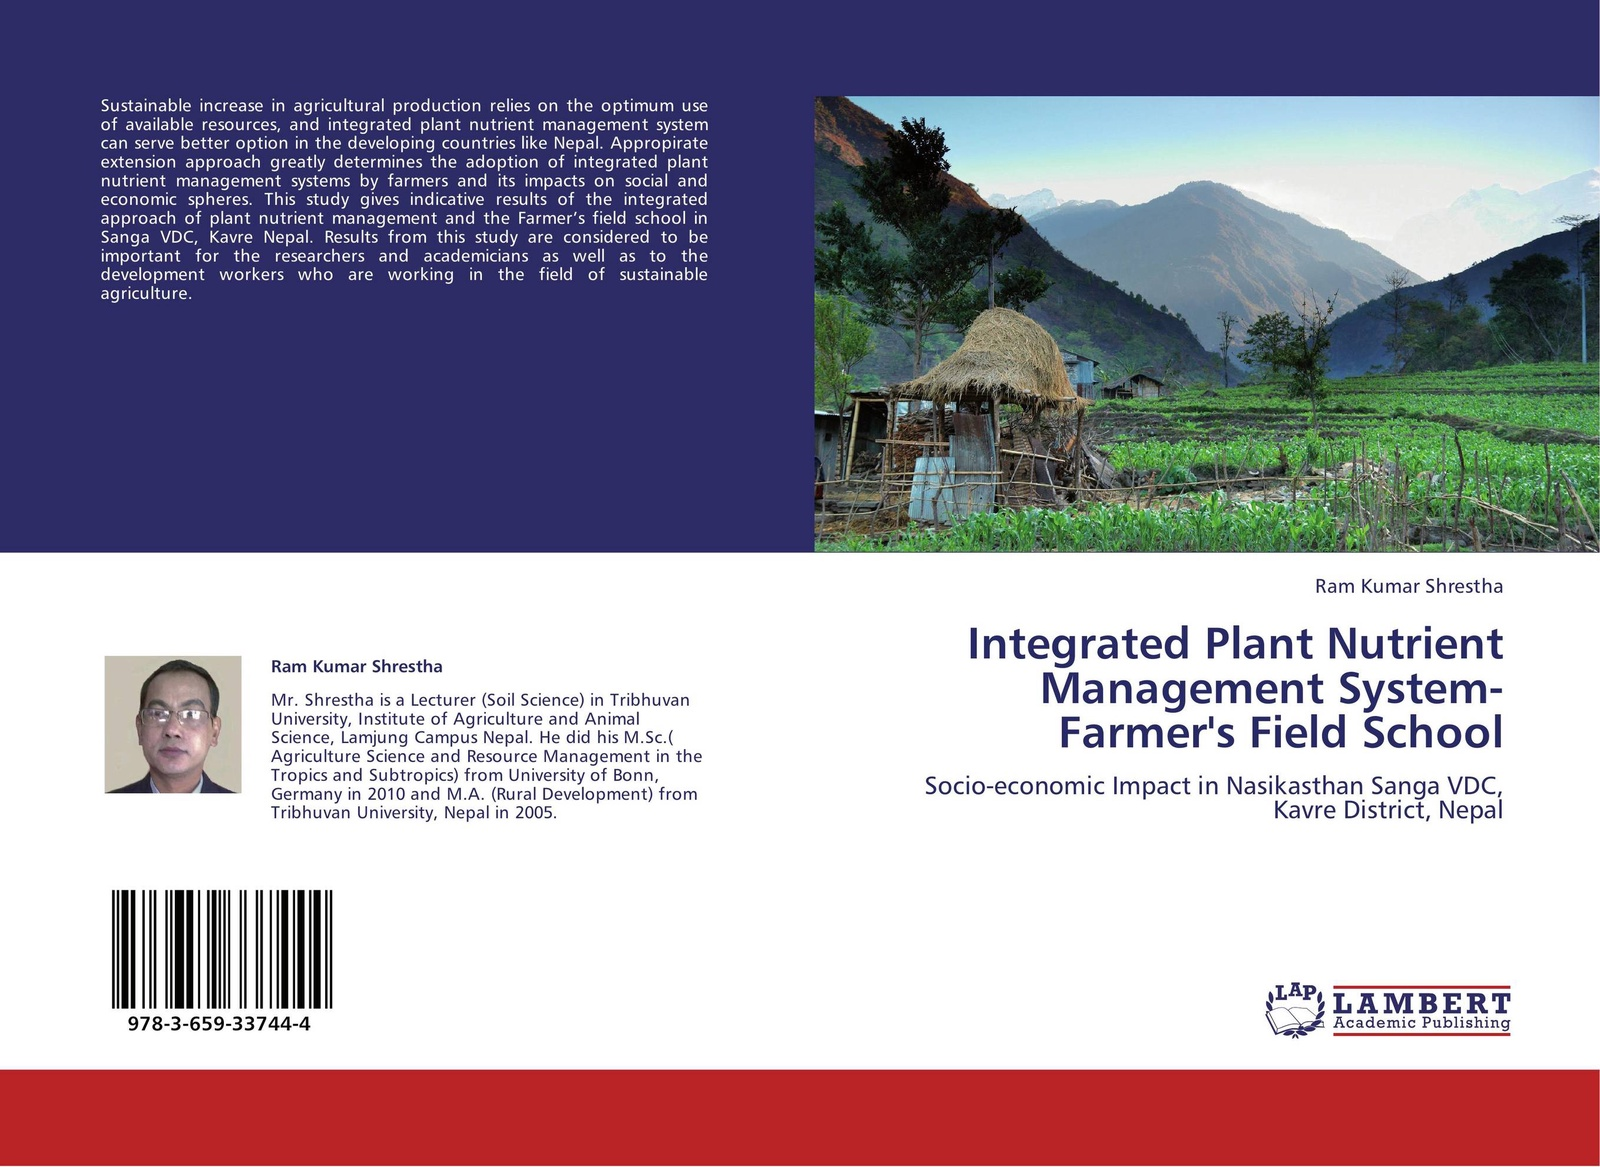 Фото - Ram Kumar Shrestha Integrated Plant Nutrient Management System-Farmer's Field School charles mischke c aquaculture pond fertilization impacts of nutrient input on production